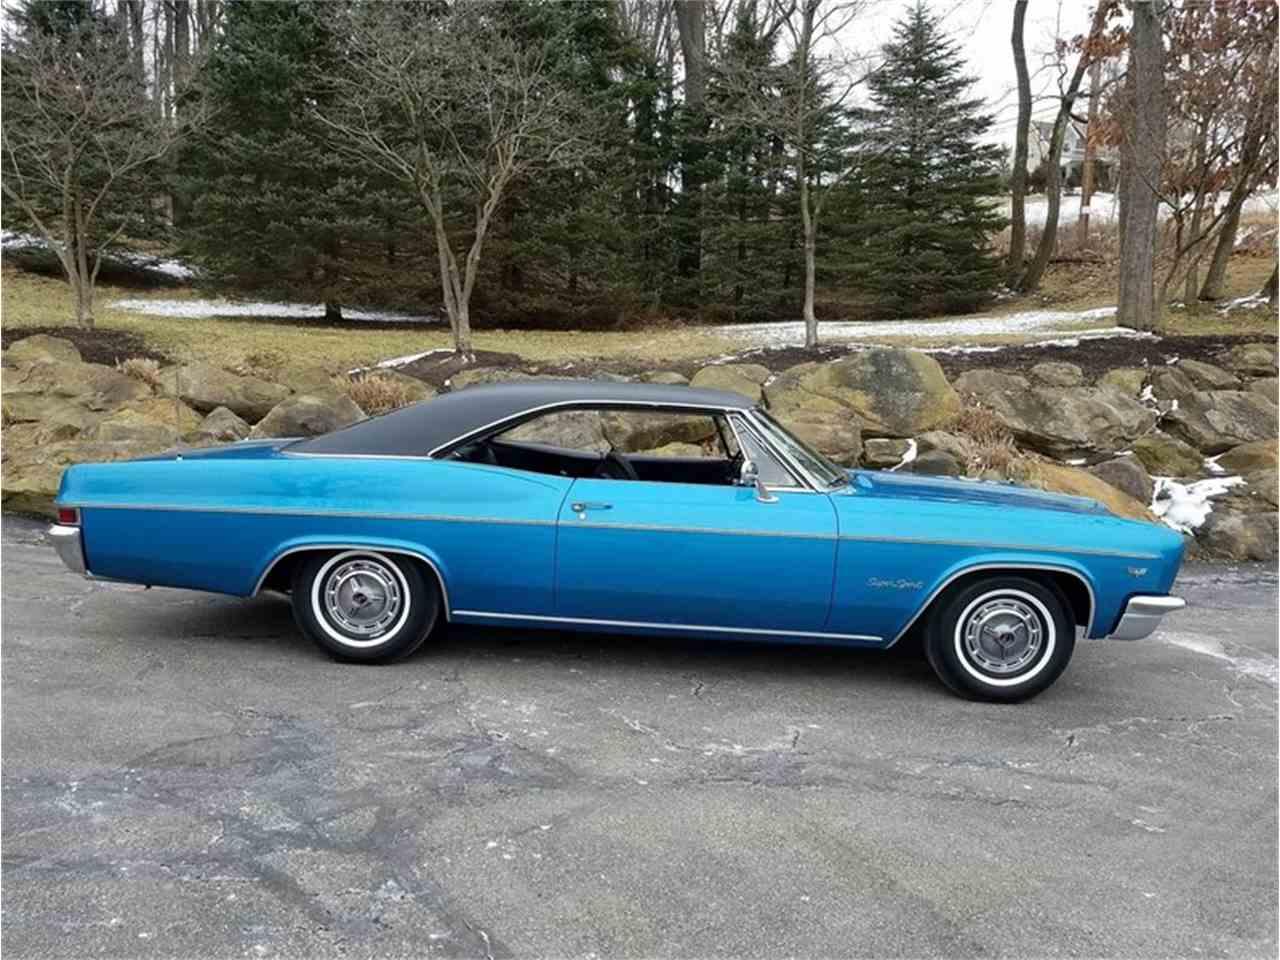 1966 chevrolet impala ss for sale cc 1065972. Black Bedroom Furniture Sets. Home Design Ideas